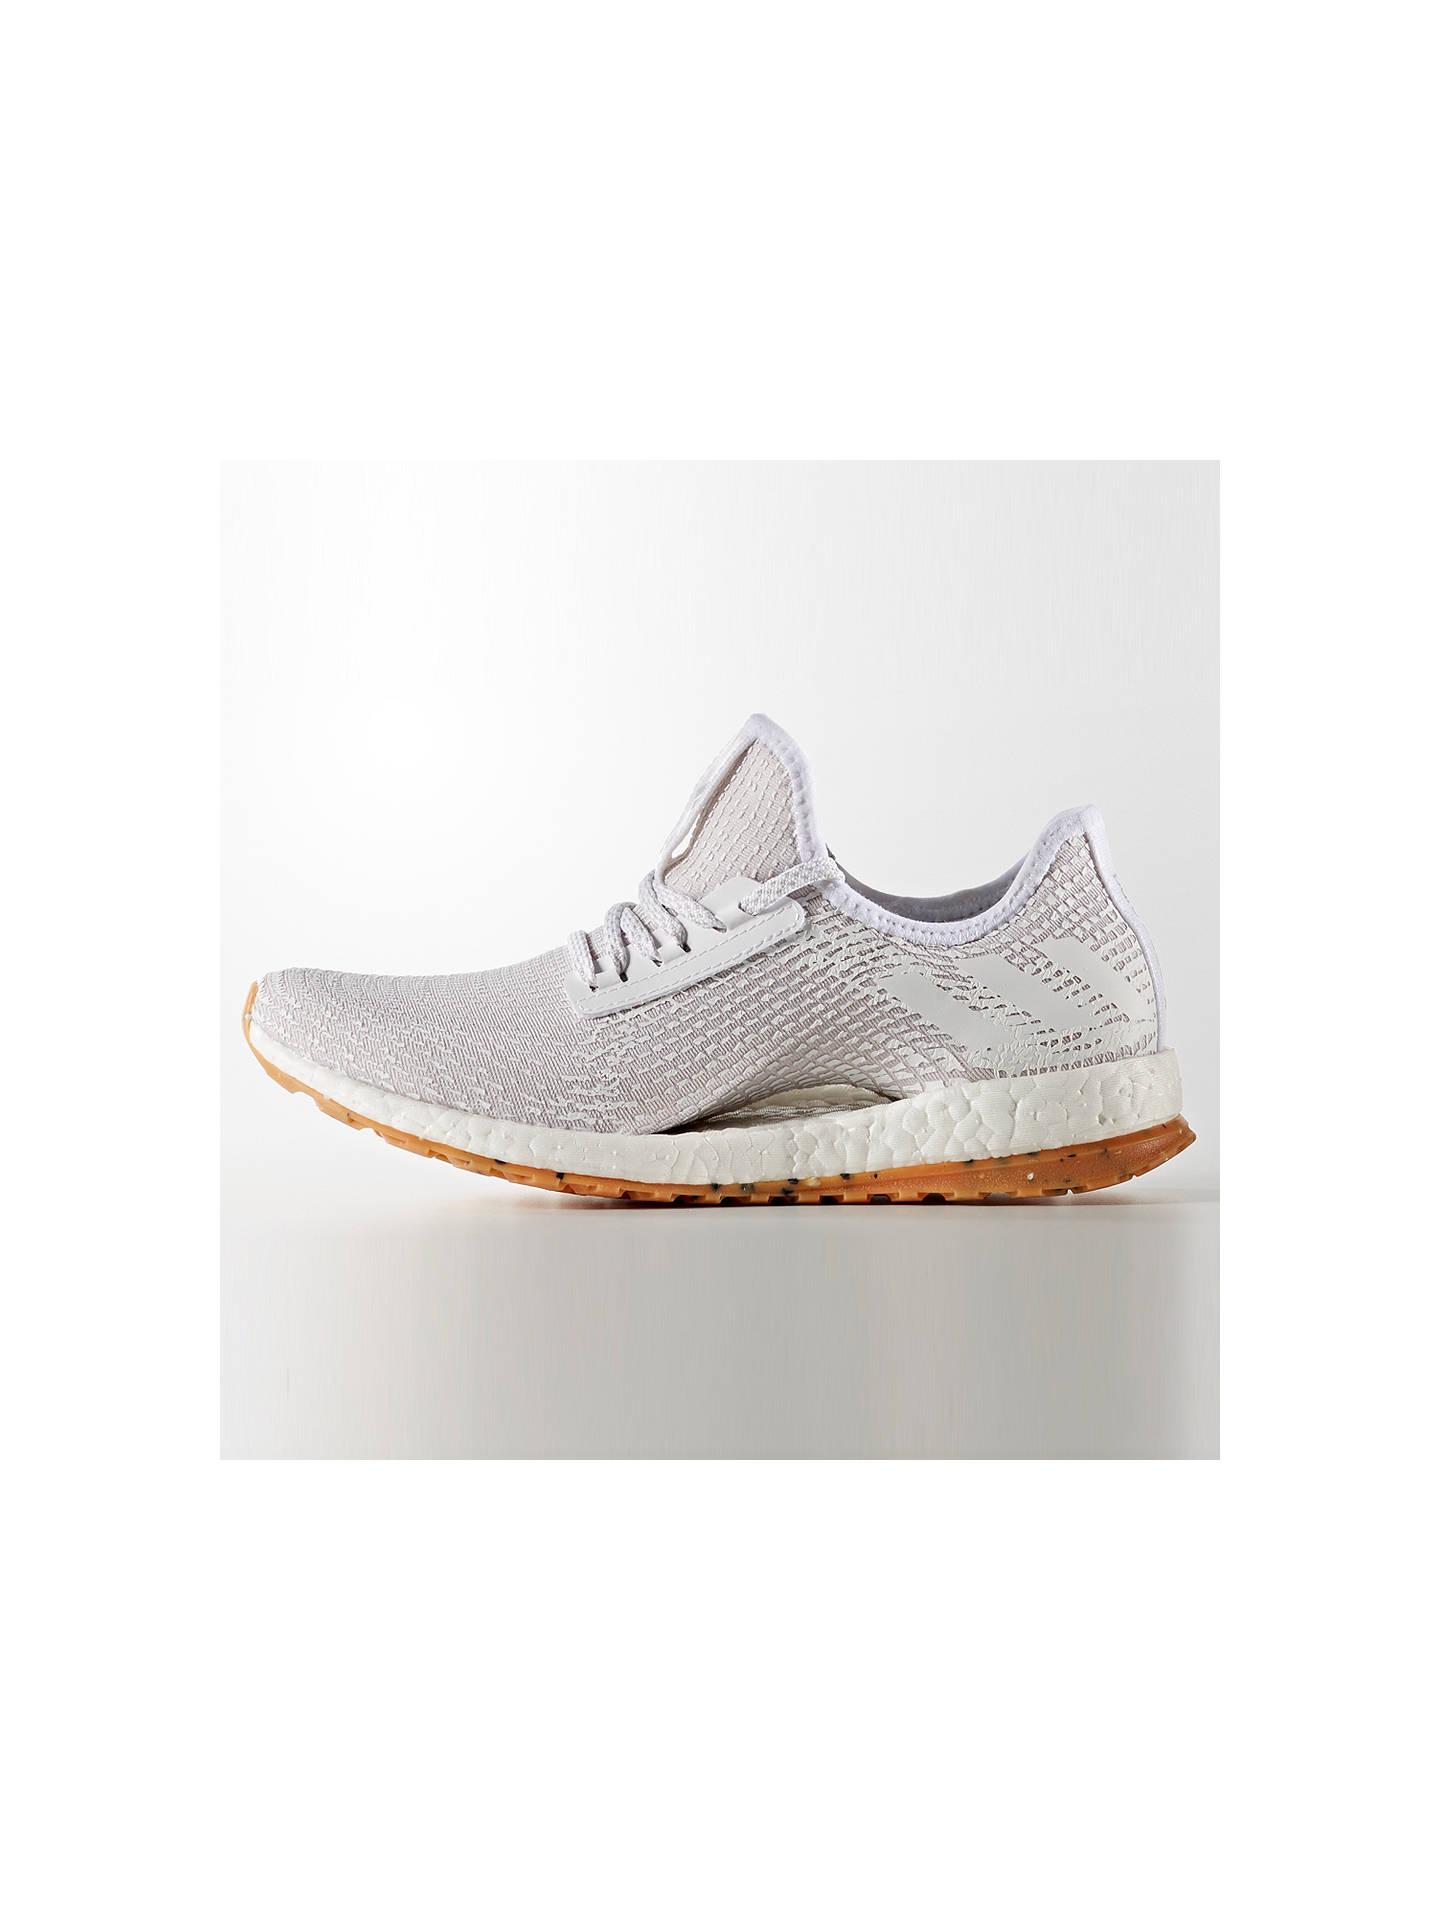 8b57009ac ... Buy Adidas Pureboost All-Terrain Women s Running Shoes